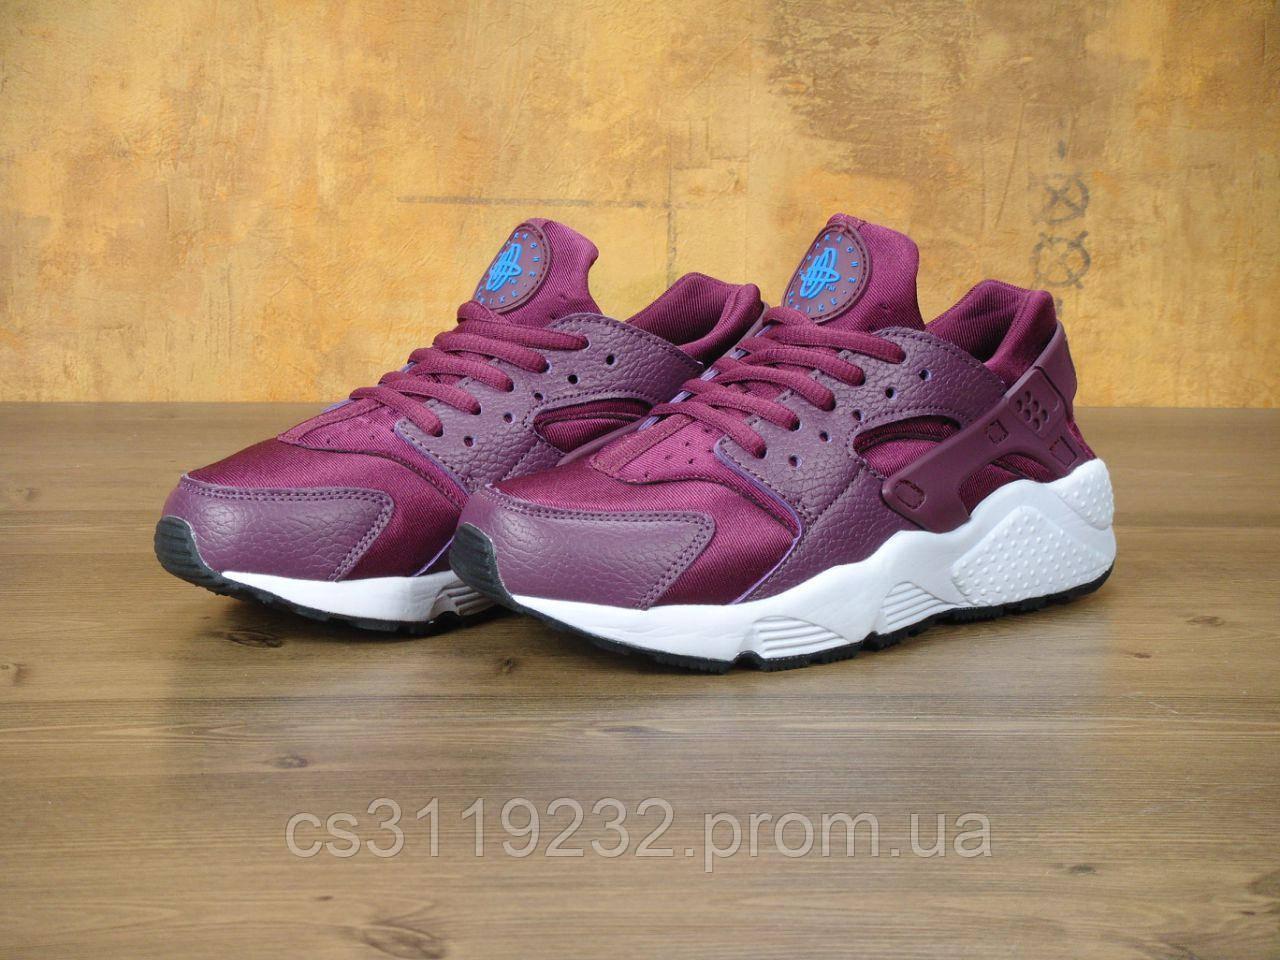 Женские кроссовки Nike Air Huarache (фиолетовые)